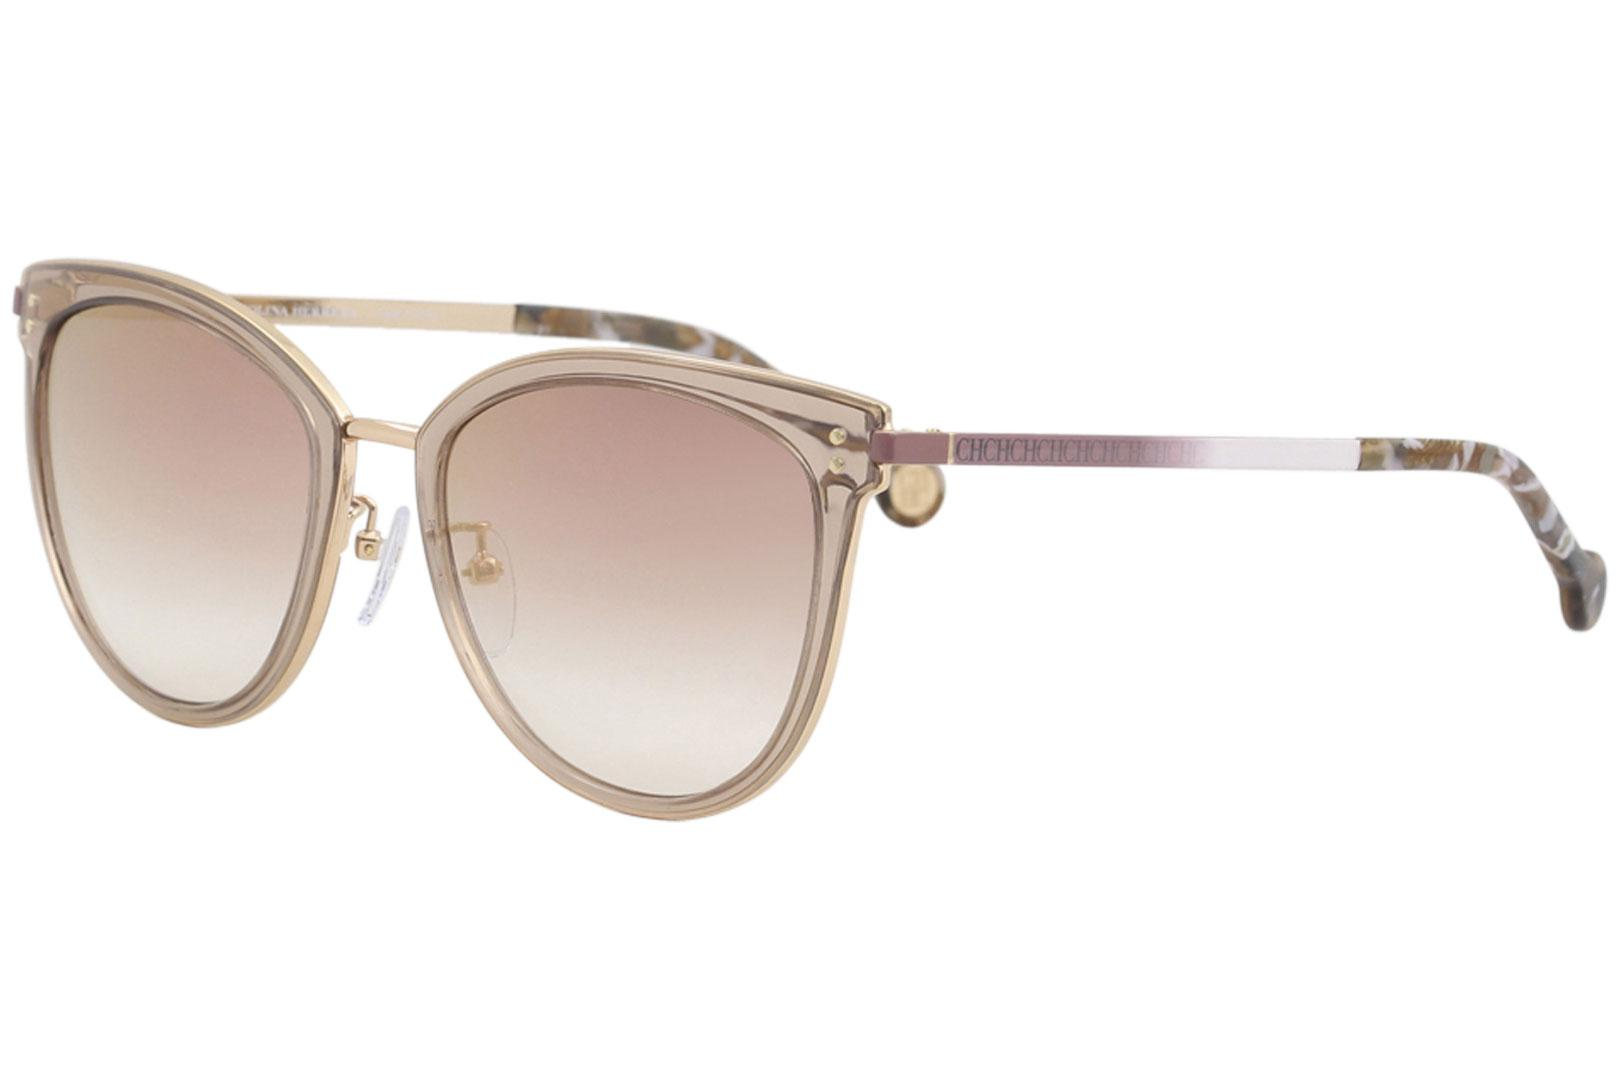 473f2b48f0 CH Carolina Herrera Women s SHE102 SHE 102 Fashion Cat Eye Sunglasses